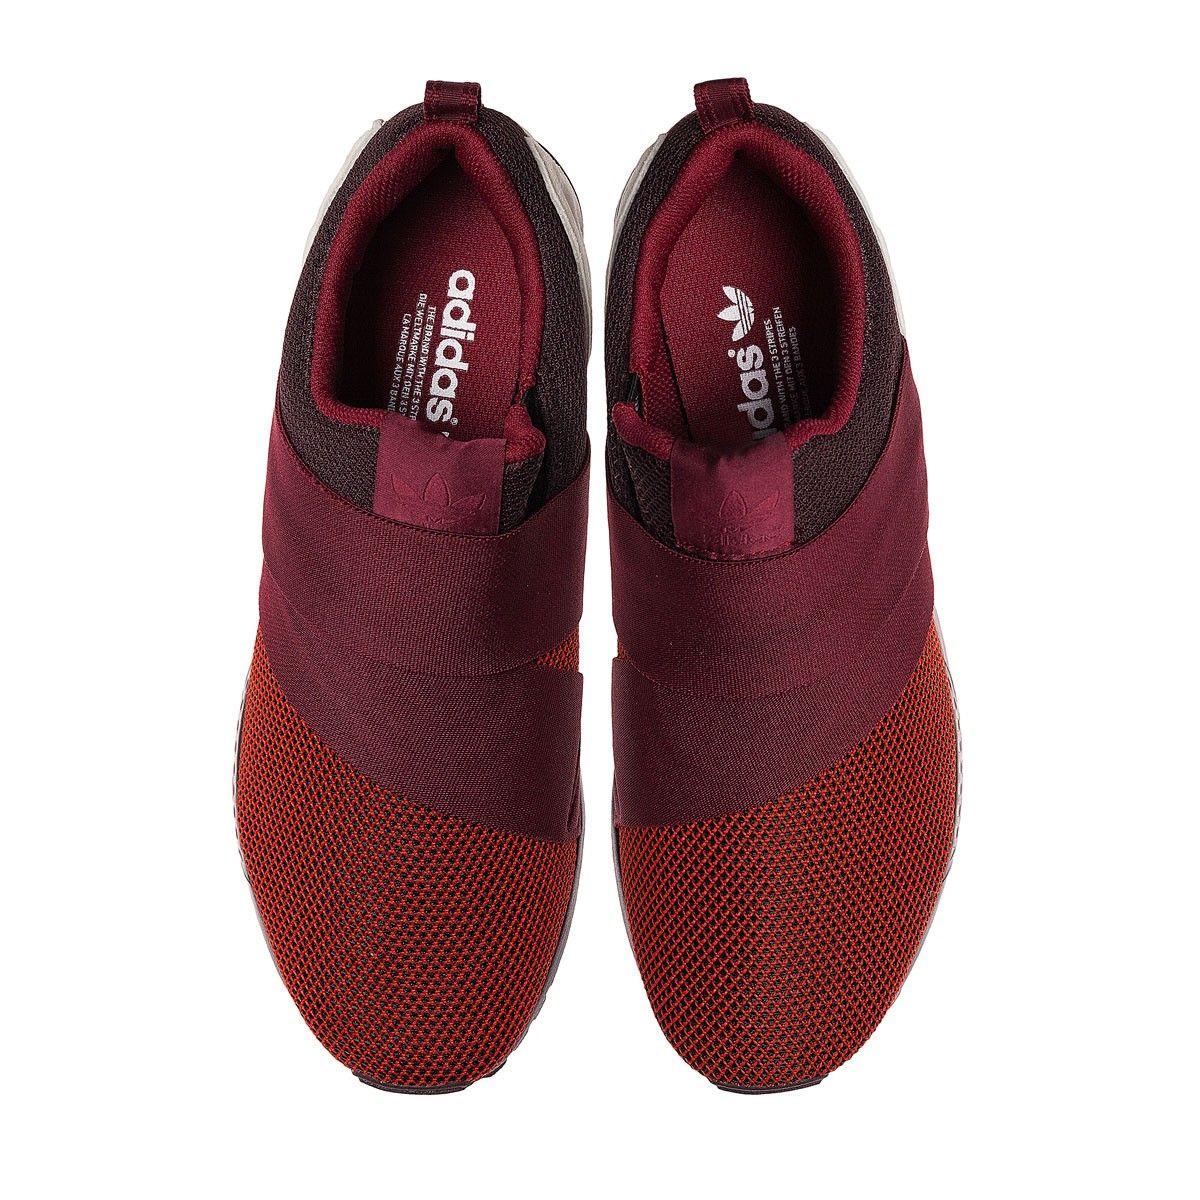 fd2b9f2ea adidas originals ZX Flux Slip On Footwear - Slam Jam Socialism ...